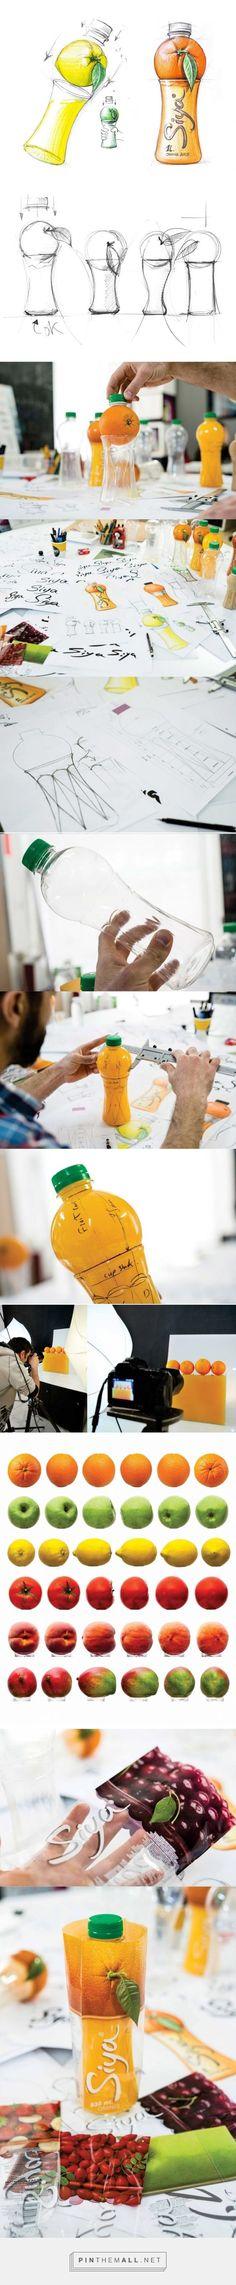 Siya Juice Packaging Development by Backbone Branding - http://www.packagingoftheworld.com/2016/04/siya.html: